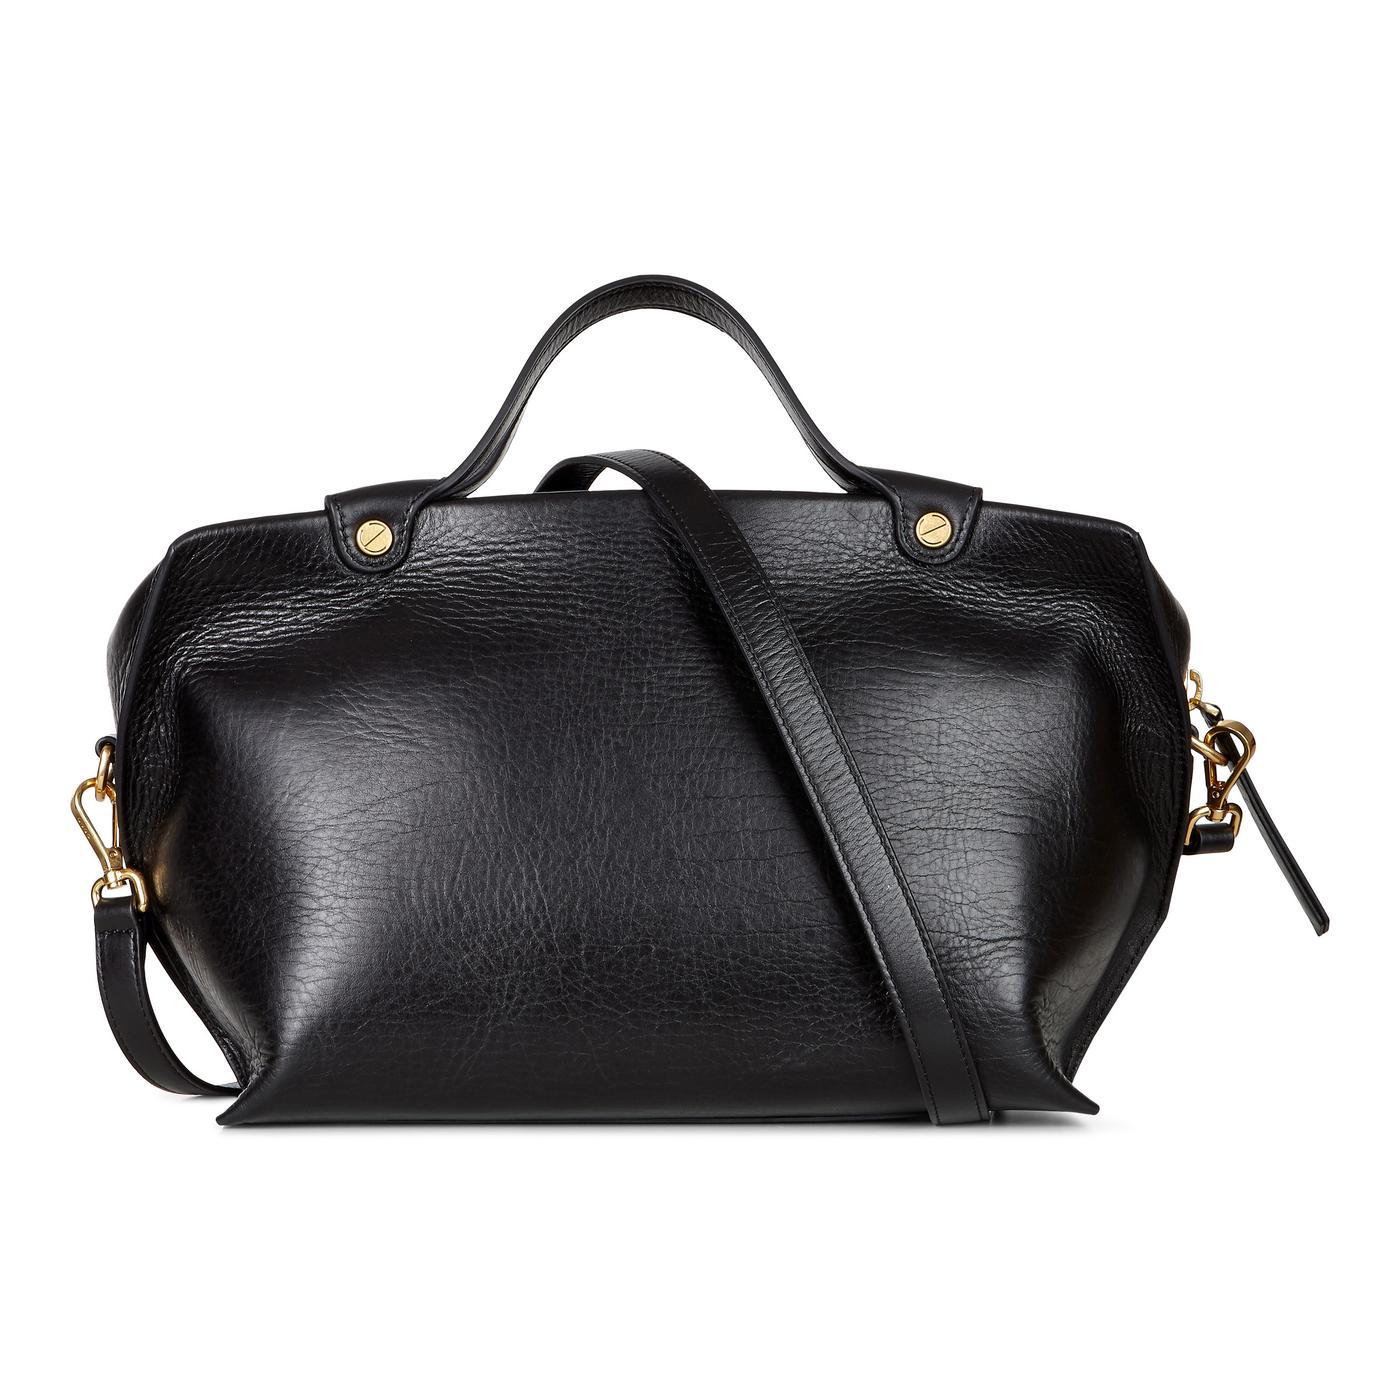 ECCO Sculptured Handbag